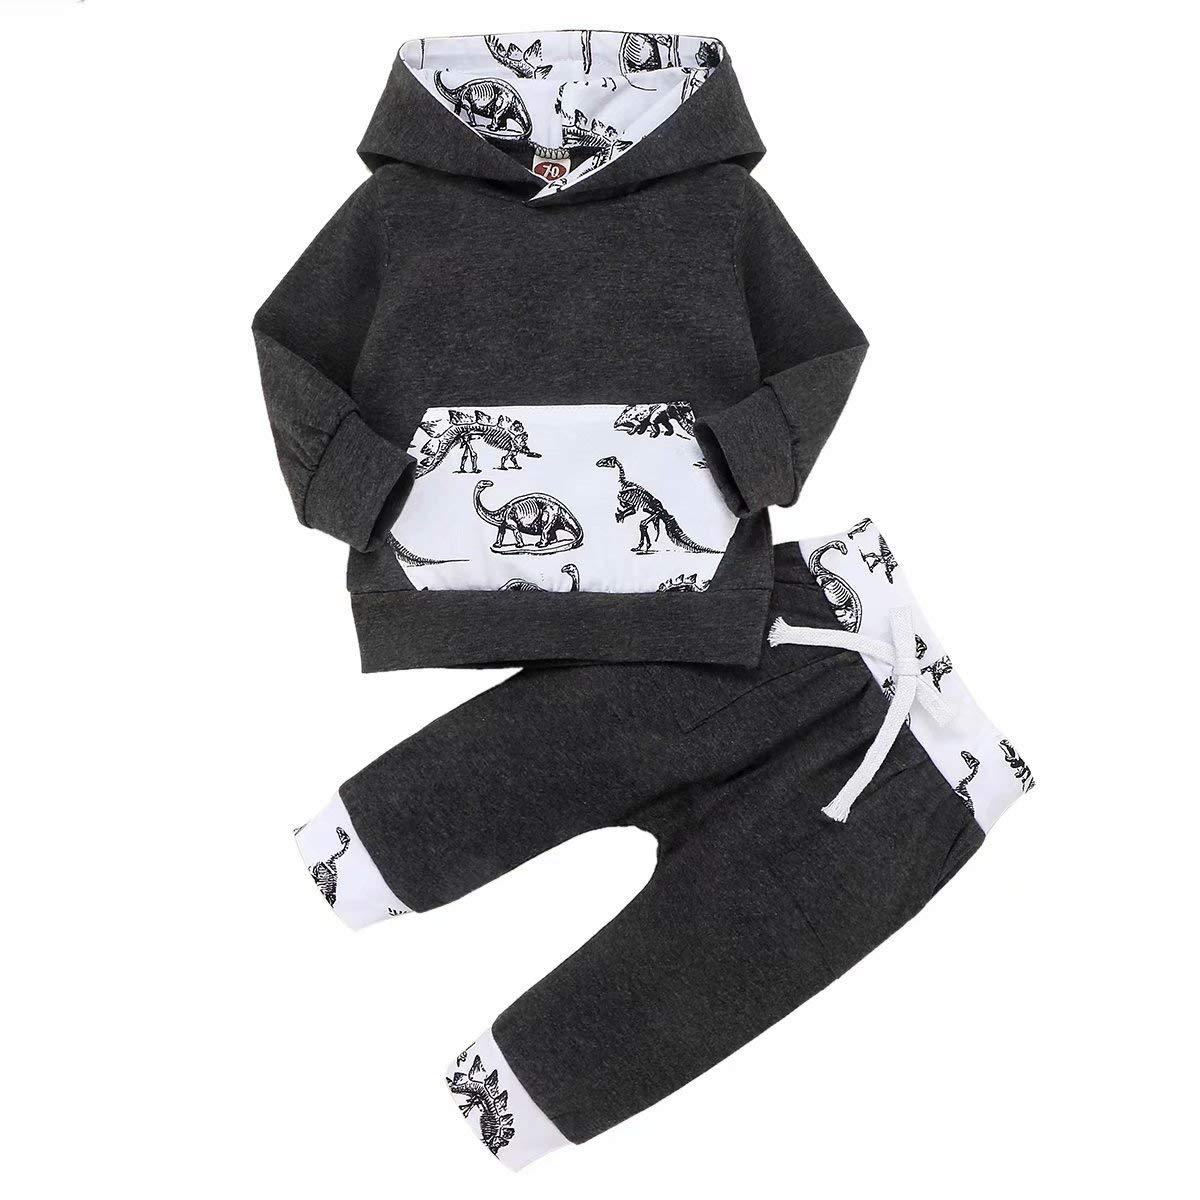 Baby Boy Clothes Dinosaur Newborn Sweatsuit Cotton Pocket Tops Pant 0-36 Months